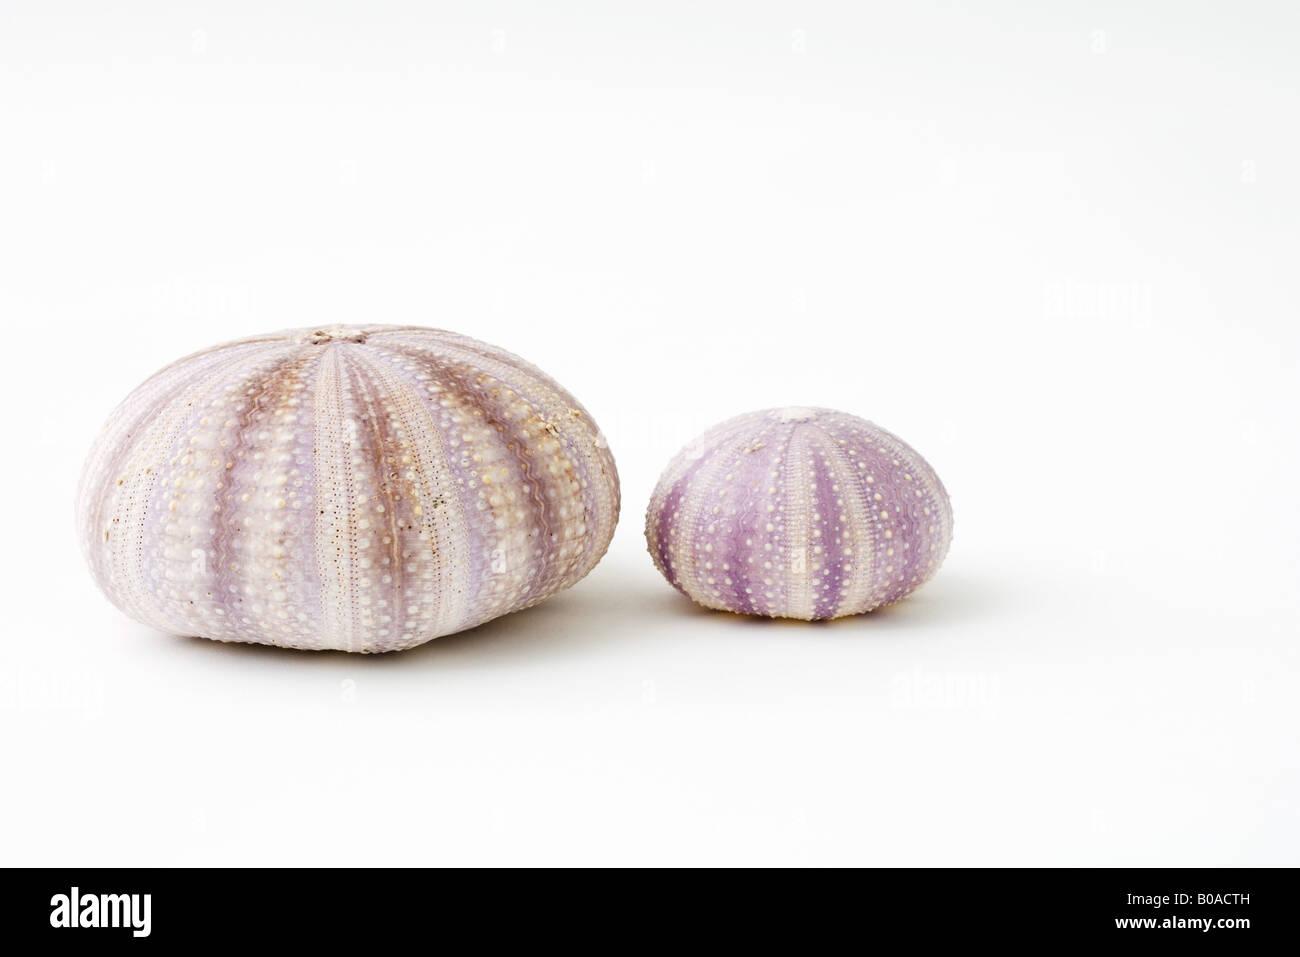 Dried sea urchin shells - Stock Image